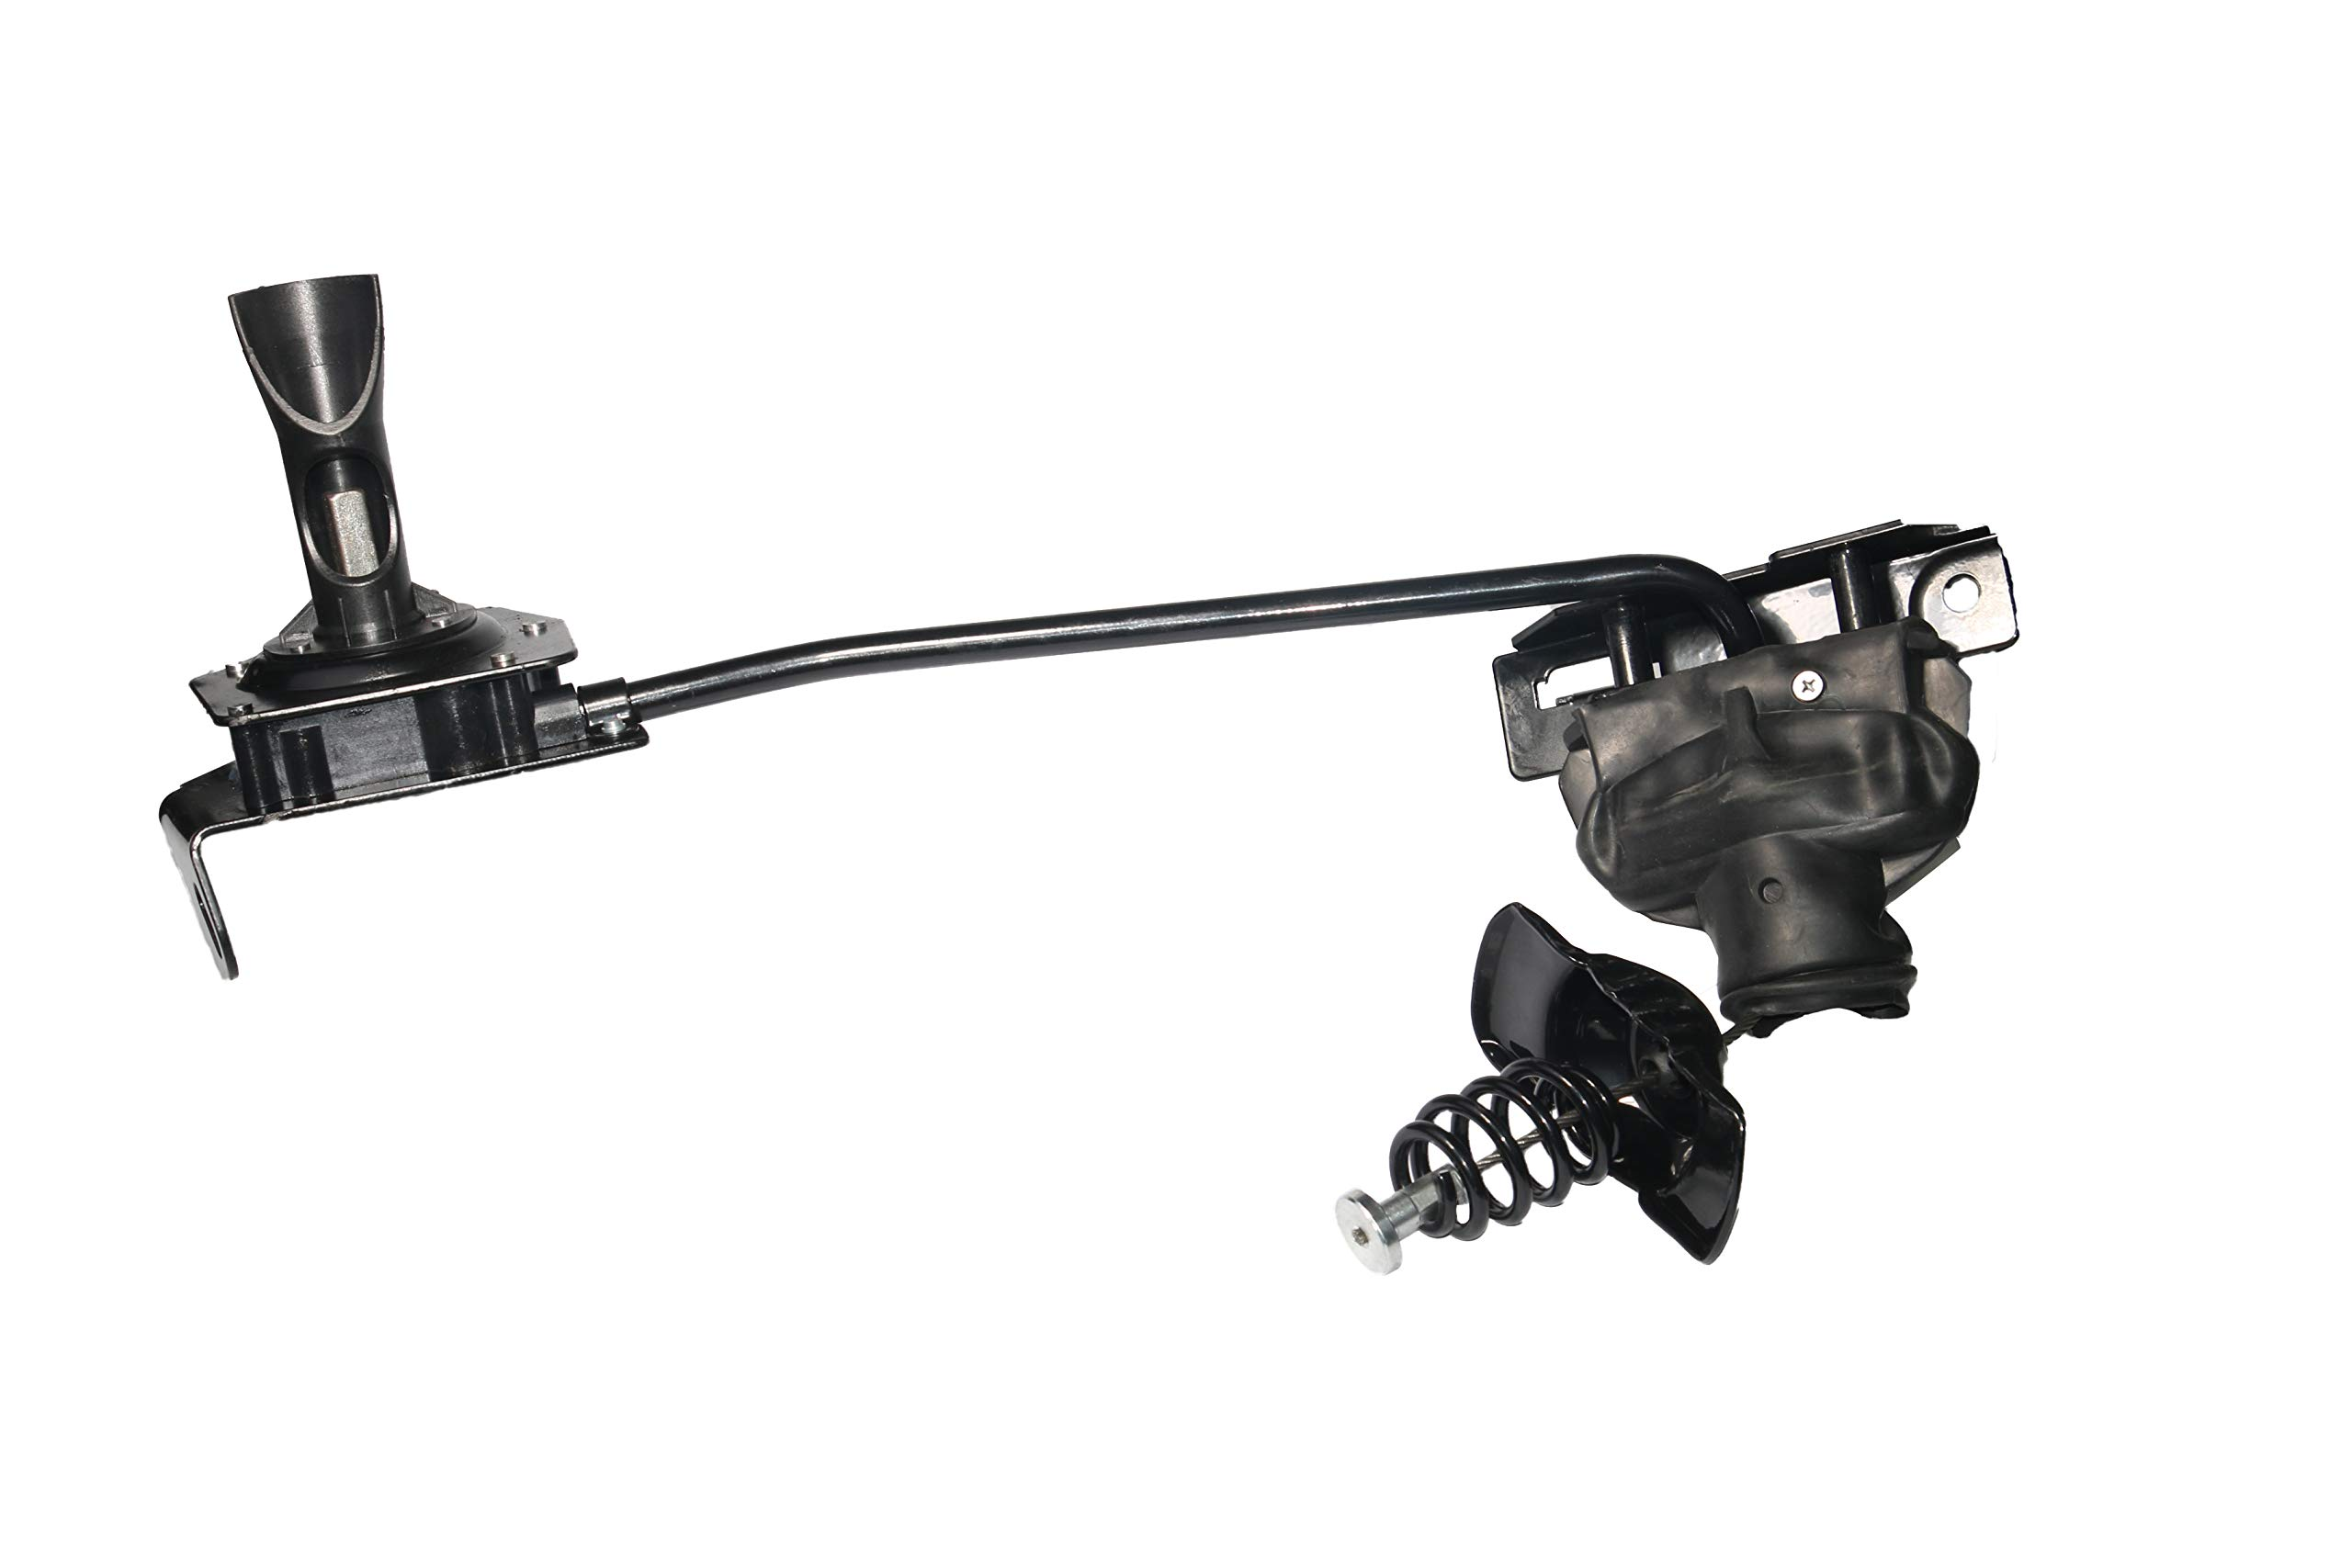 Spare Tire Hoist - Replaces# 924-509, 25911640, 15247311, 88940274, 924509 - Fits Chevy Trailblazer, EXT, GMC Envoy, XL, Isuzu Ascender, Buick Rainier, Oldsmobile Bravada, Saab 9-7x - Rear Tyre Holder